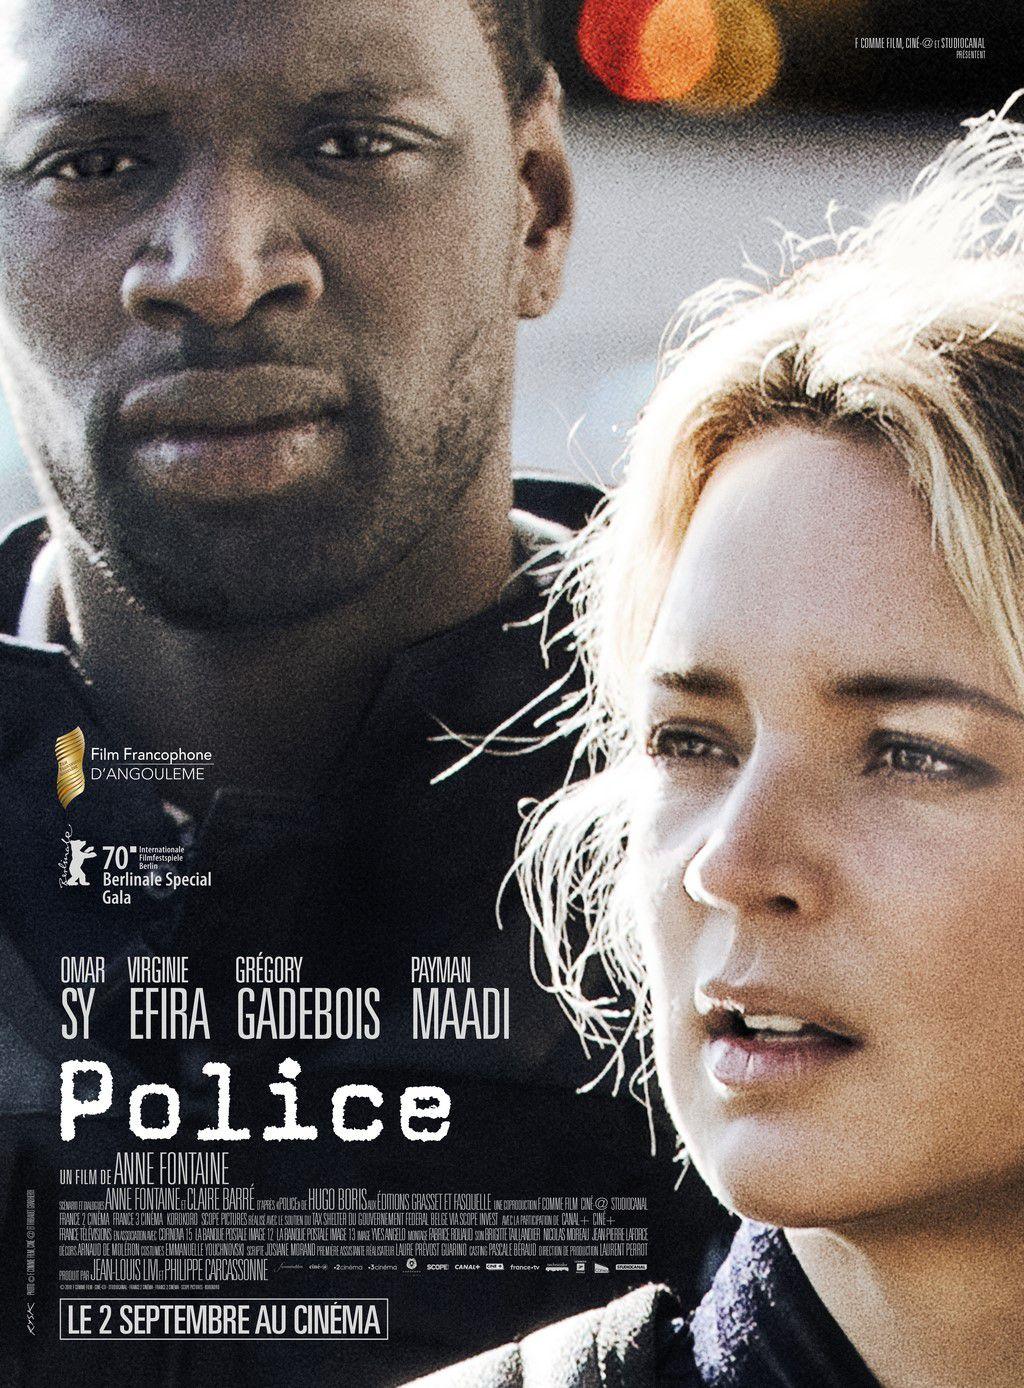 POLICE avecVirginie Efira, Omar Sy, Grégory Gadebois et Payman Maadi au cinéma le 2 septembre 2020